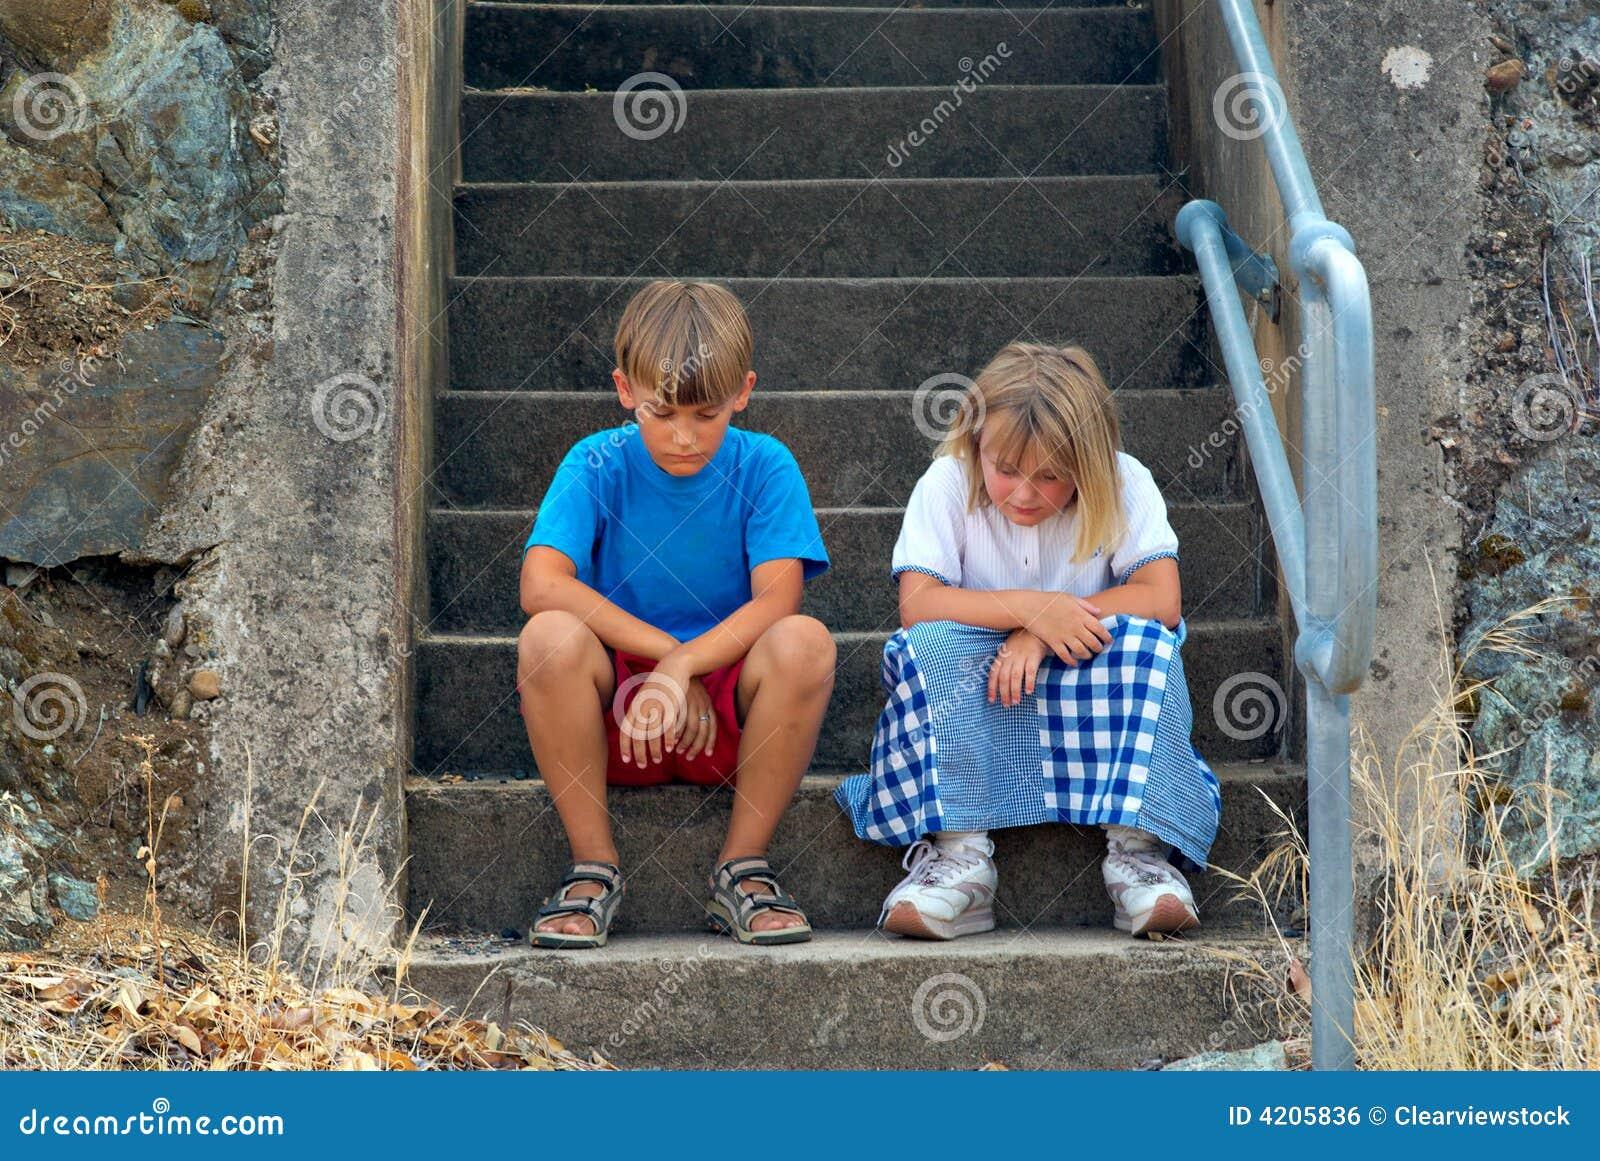 children Sitting on the steps